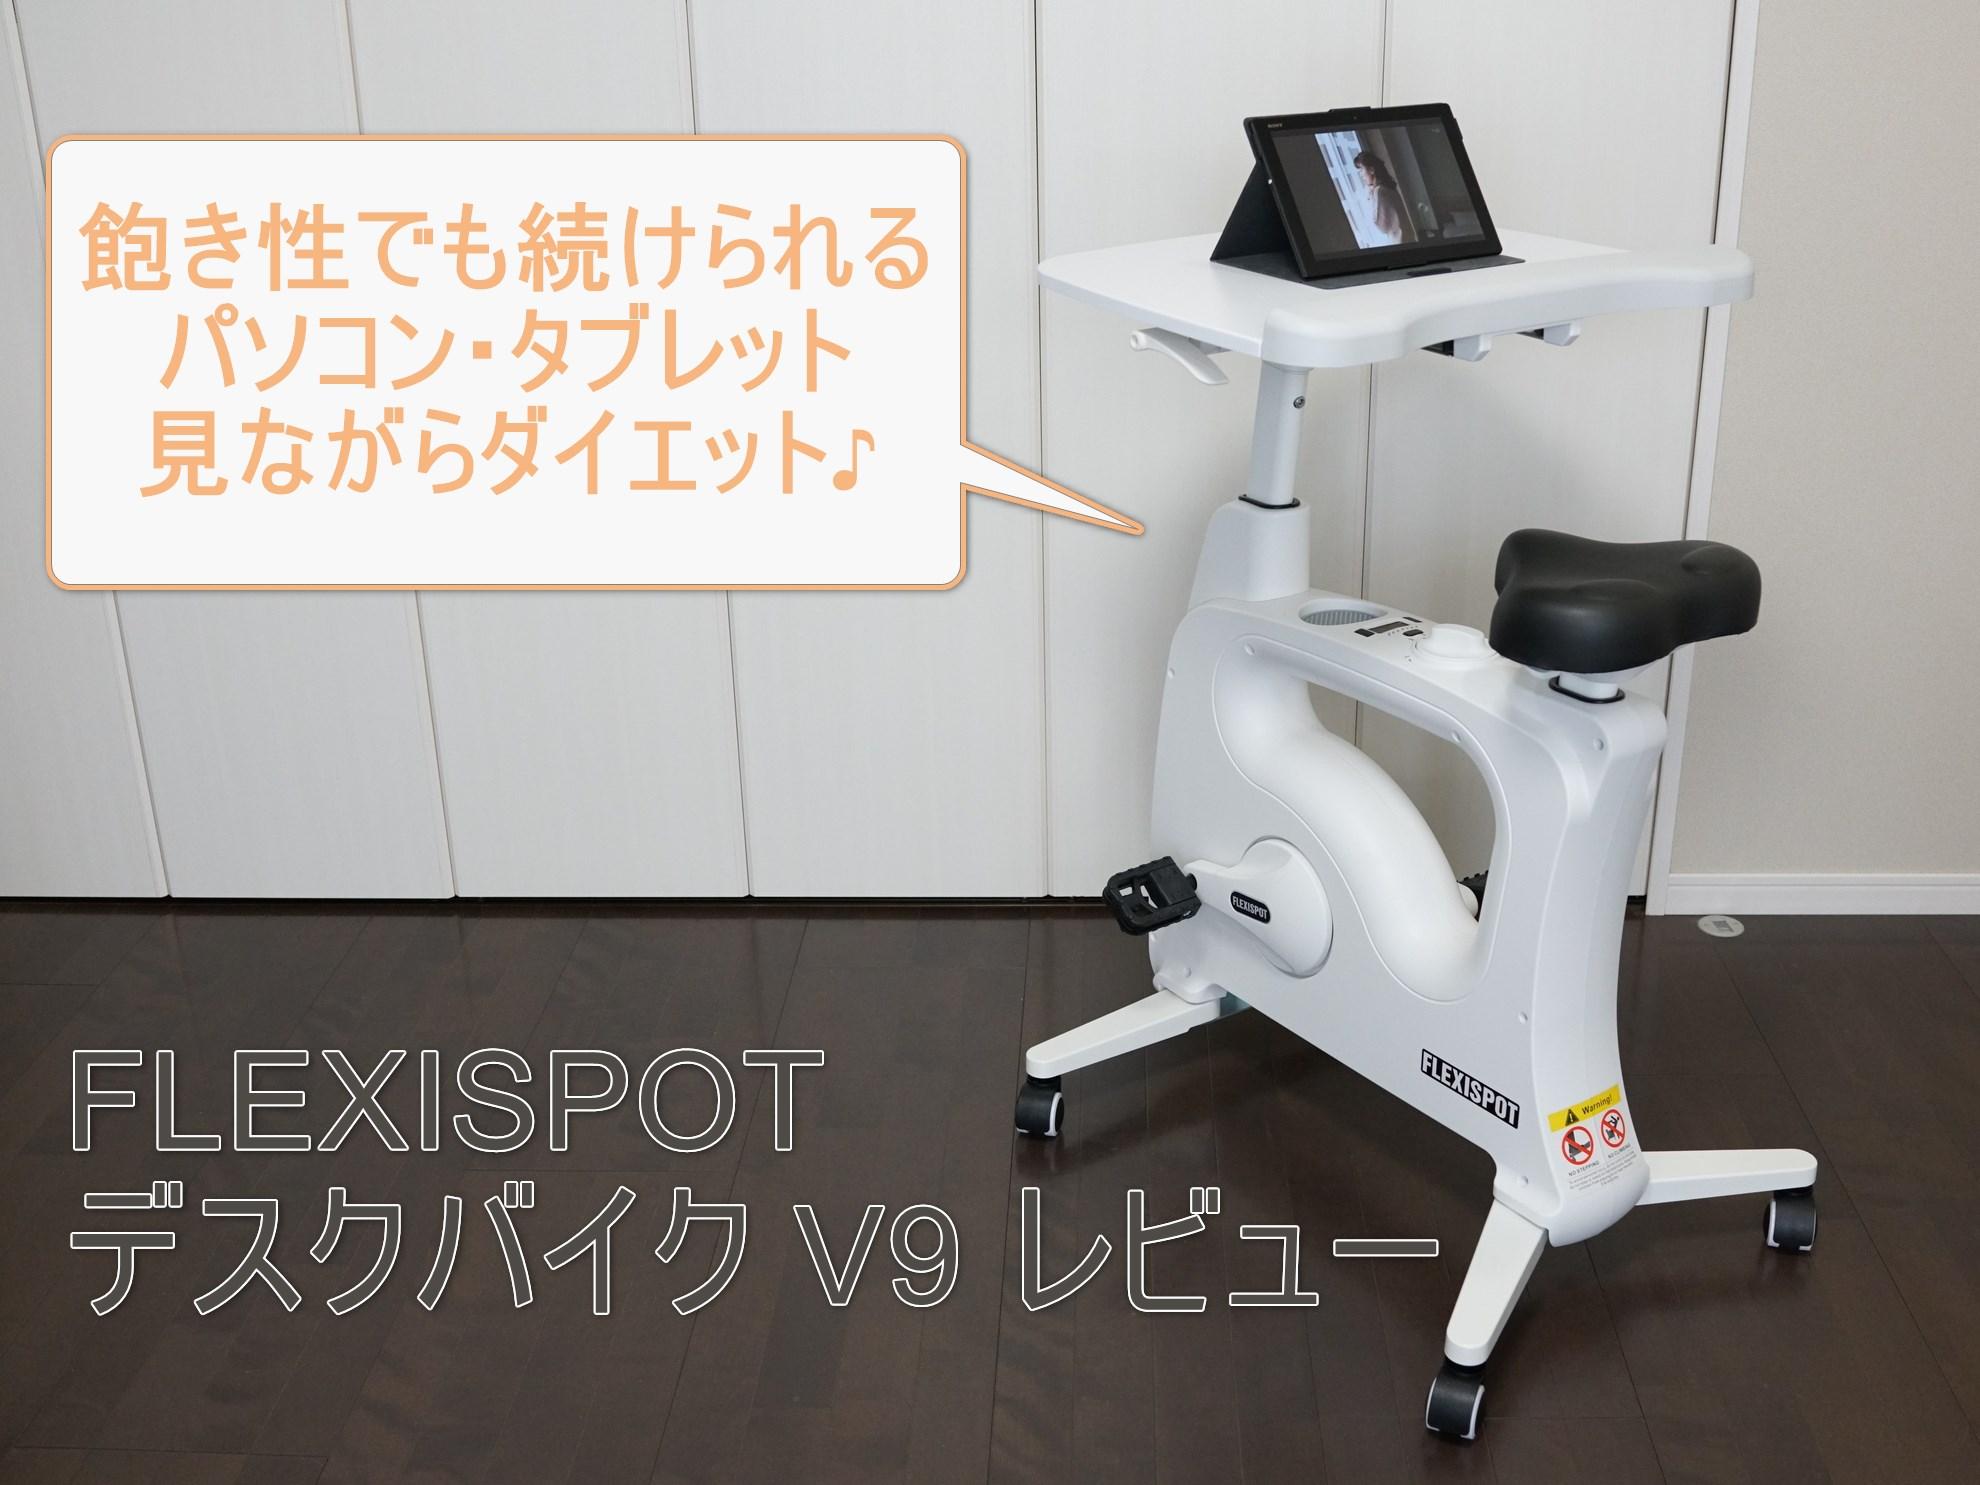 FLEXISPOT デスクバイク V9 レビュー